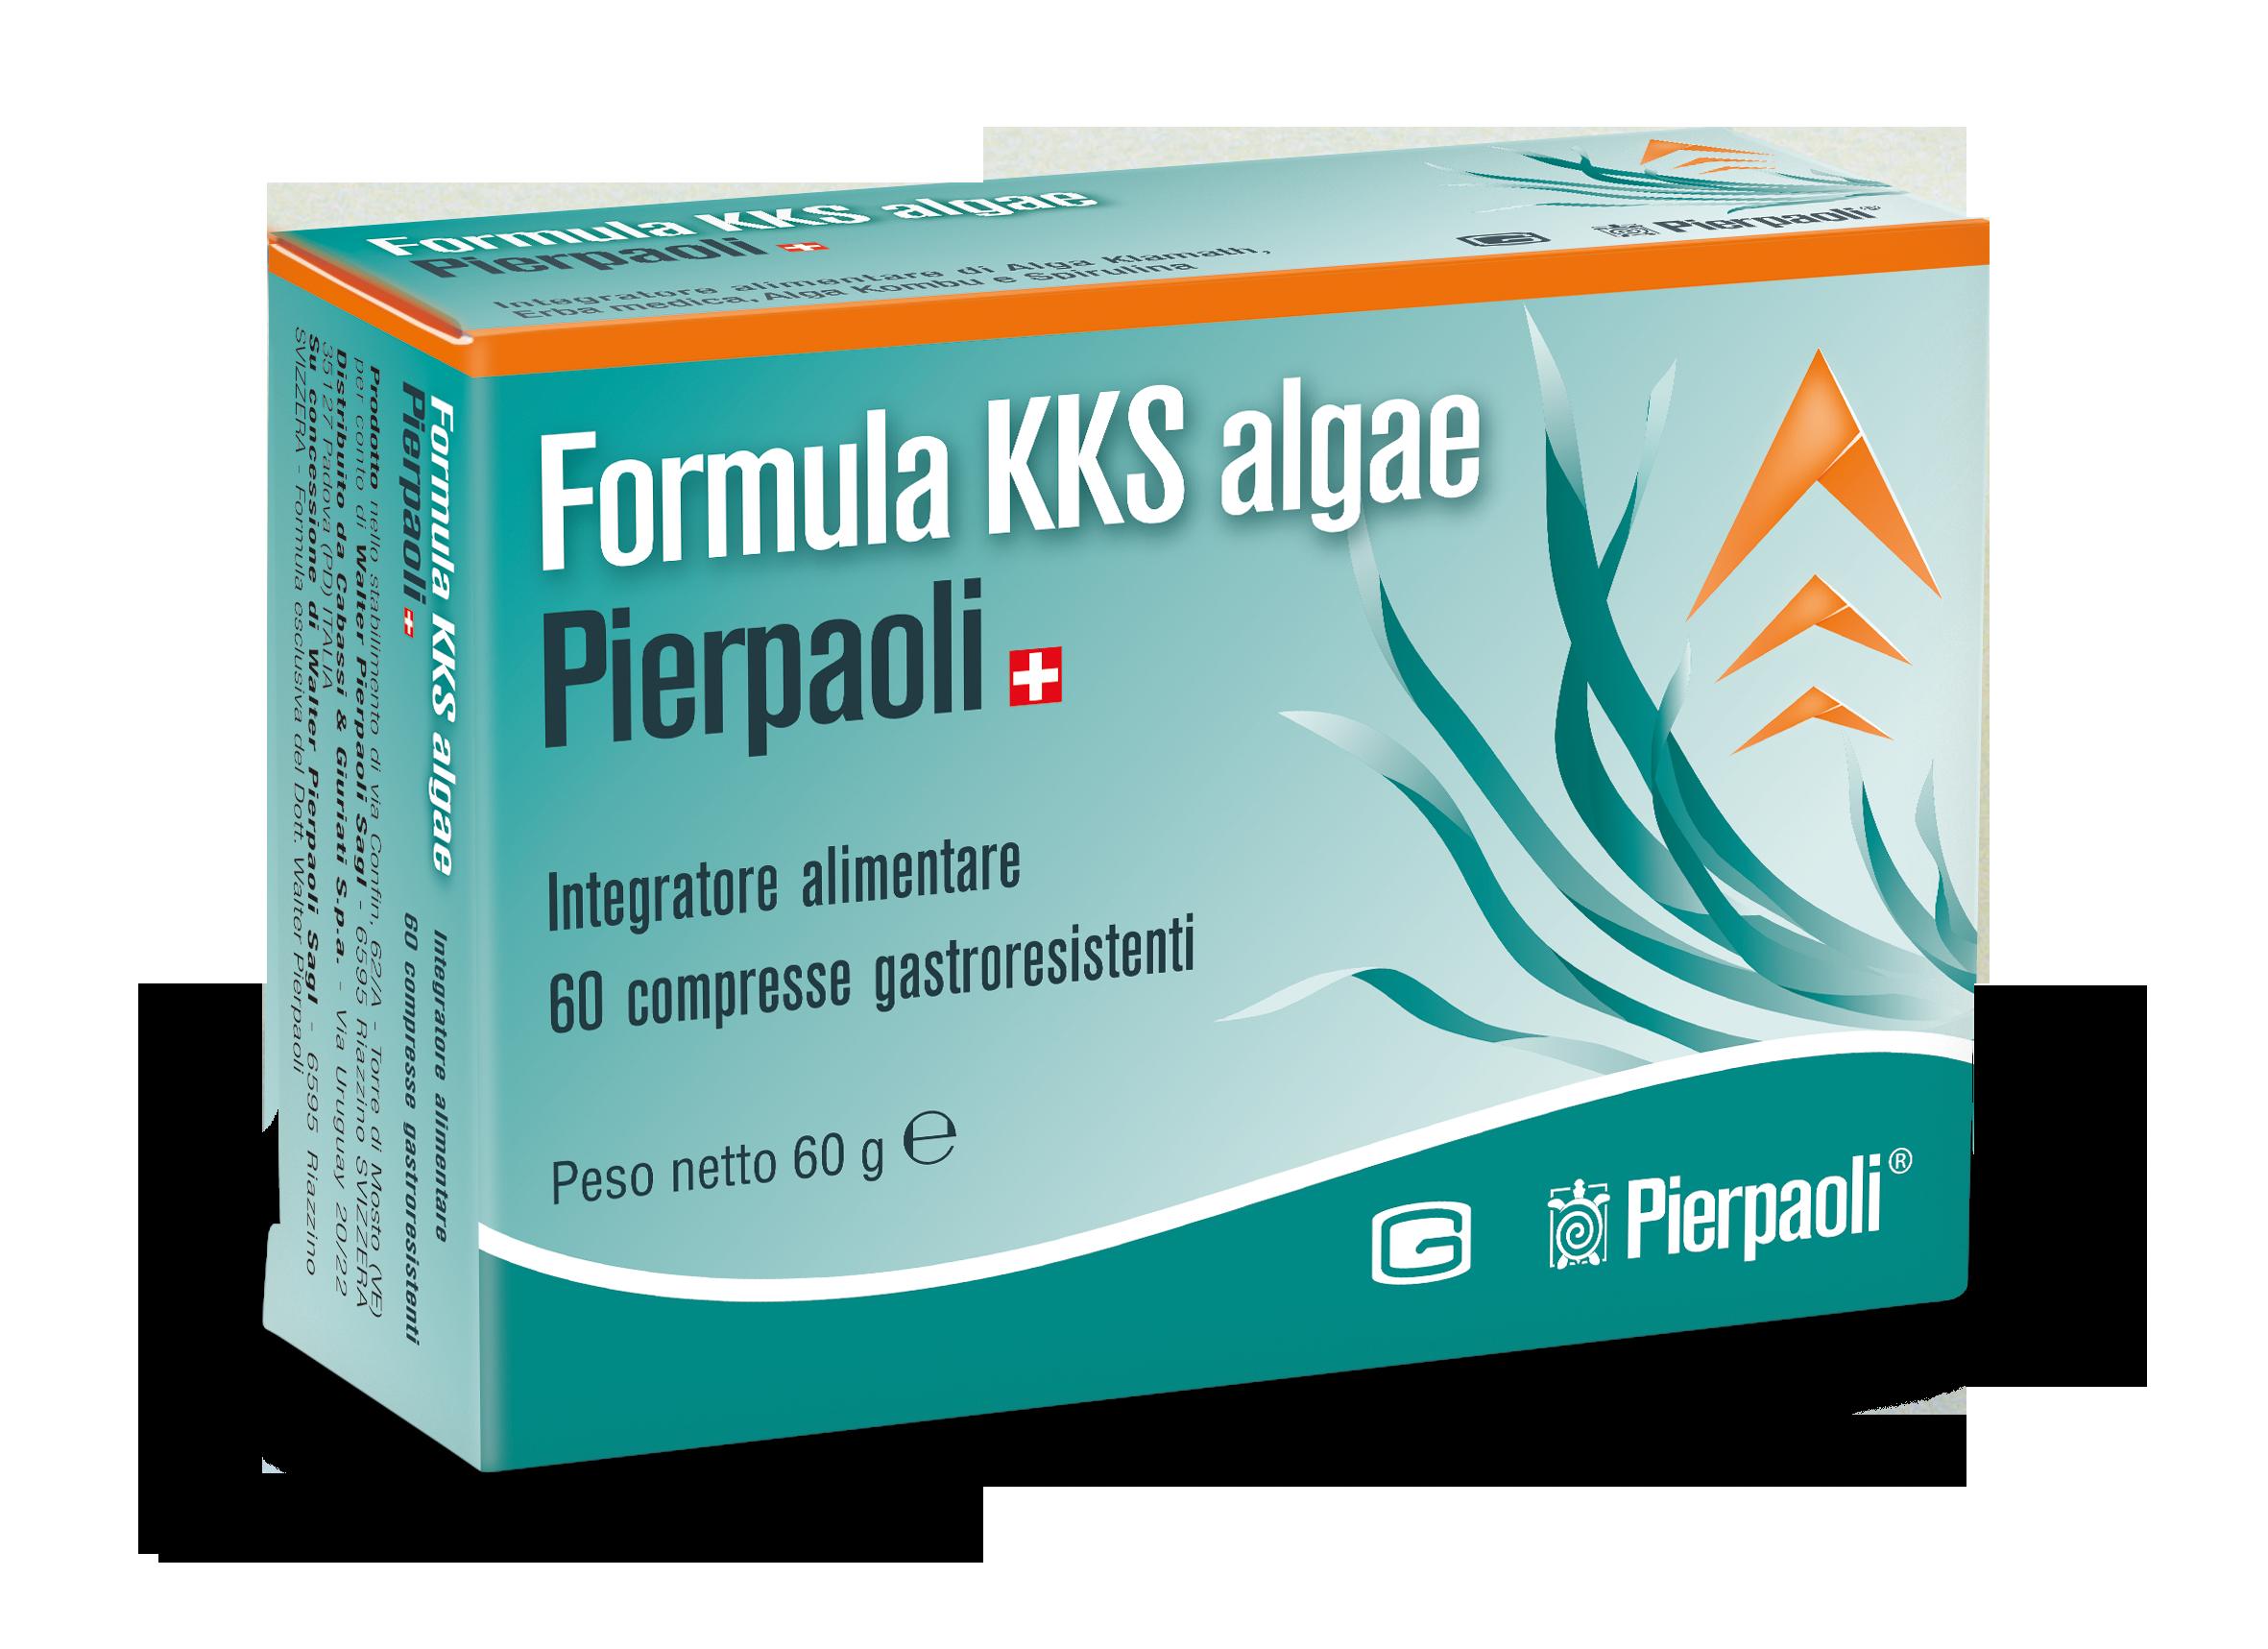 Formula_KKS_Pierpaoli